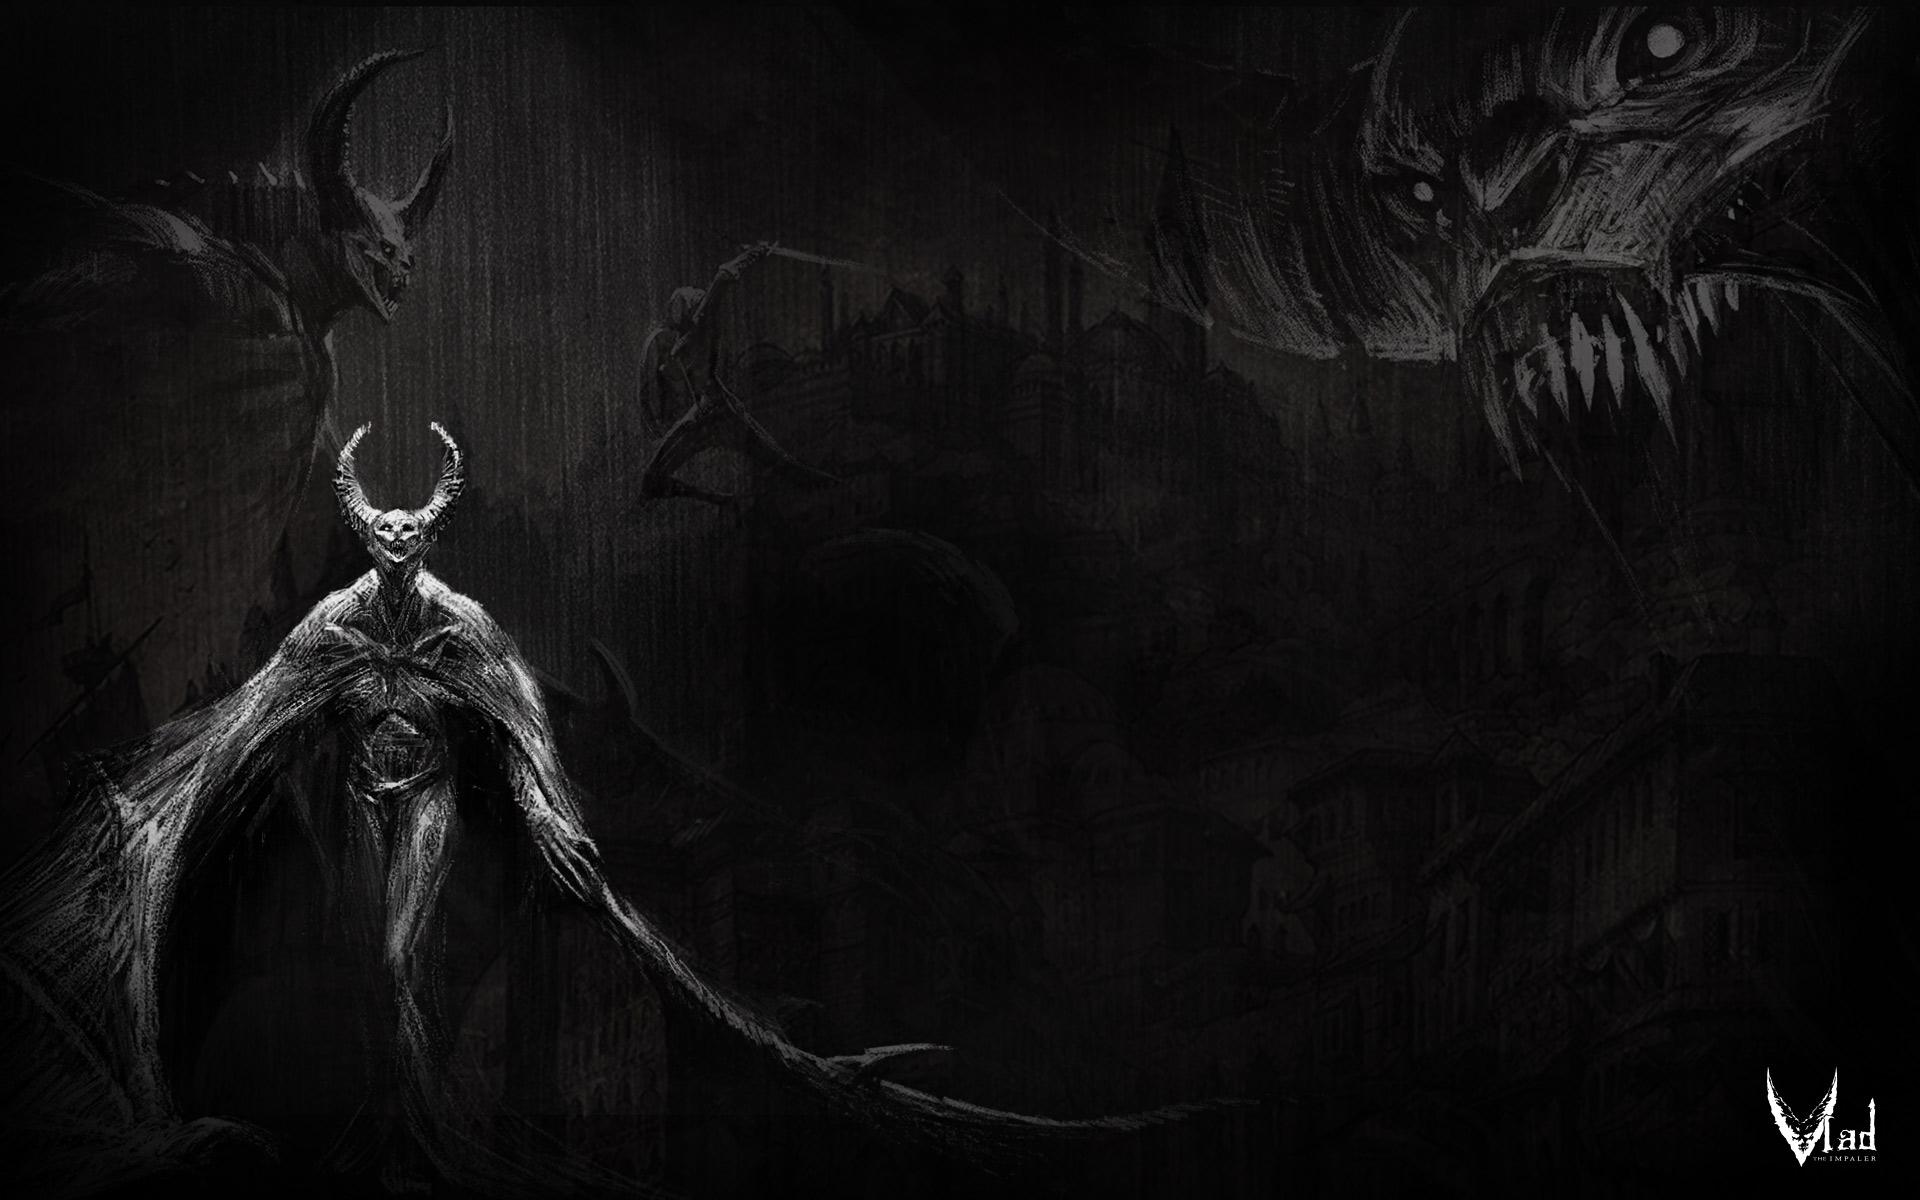 Dracul. Steam. Steam. Vlad the Impaler ...